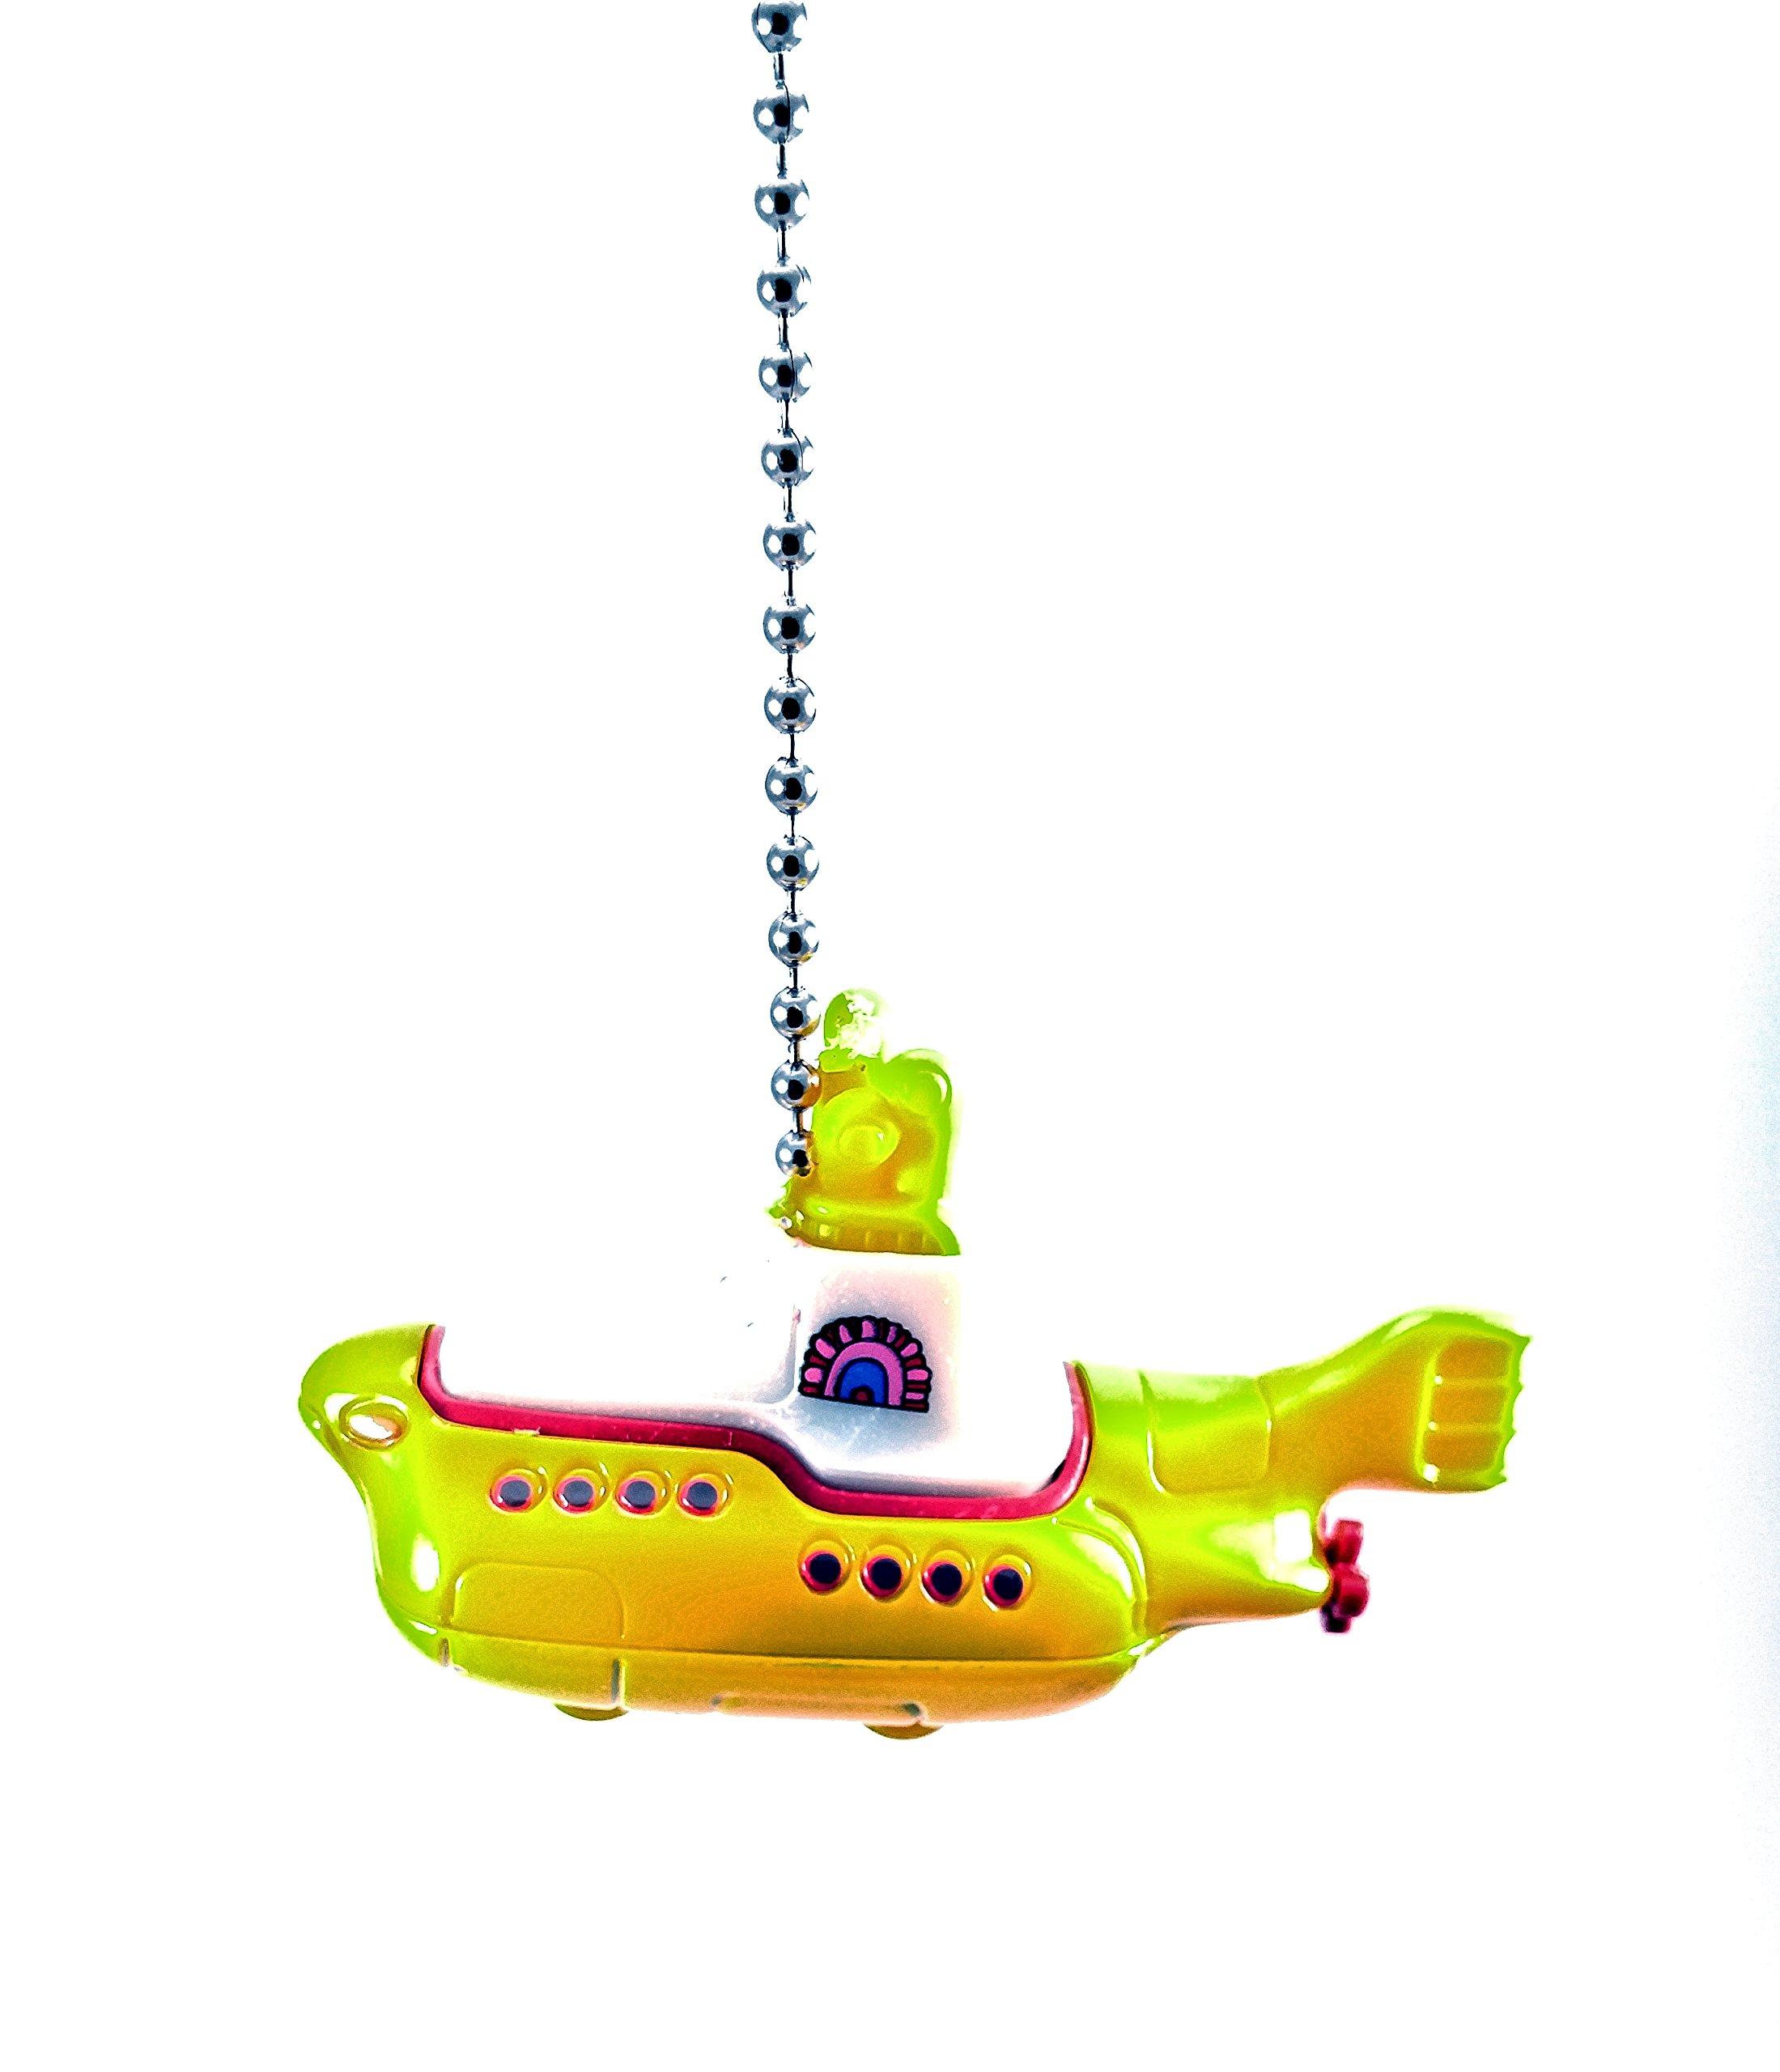 Beatles Yellow Submarine Diecast Ceiling Light Fan pull, Christmas Ornament, pendant, Keychains (Beatles Yellow Submarine)